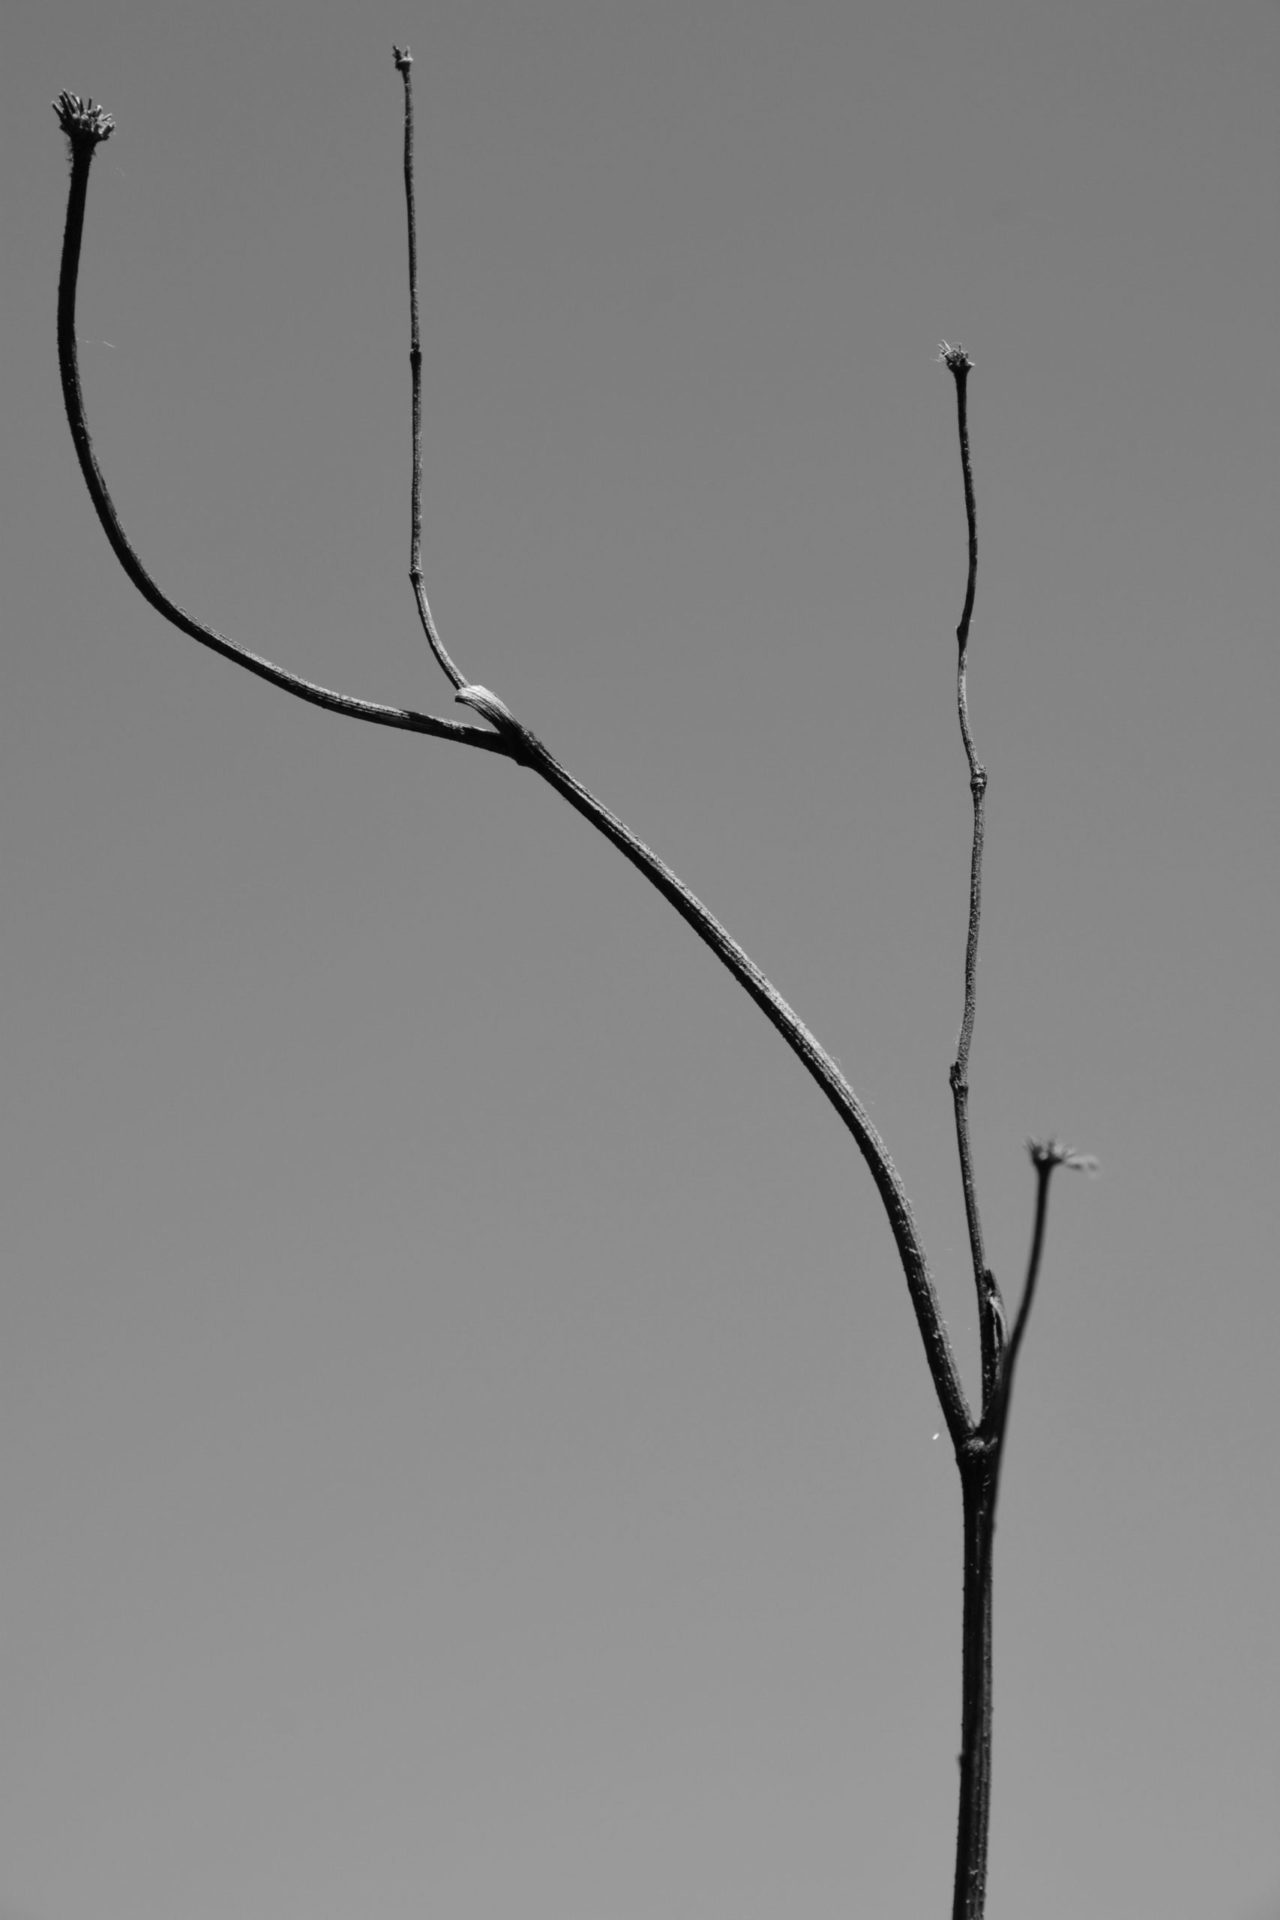 Manuel Frattini, Pflanze 2019, Courtesy the artist